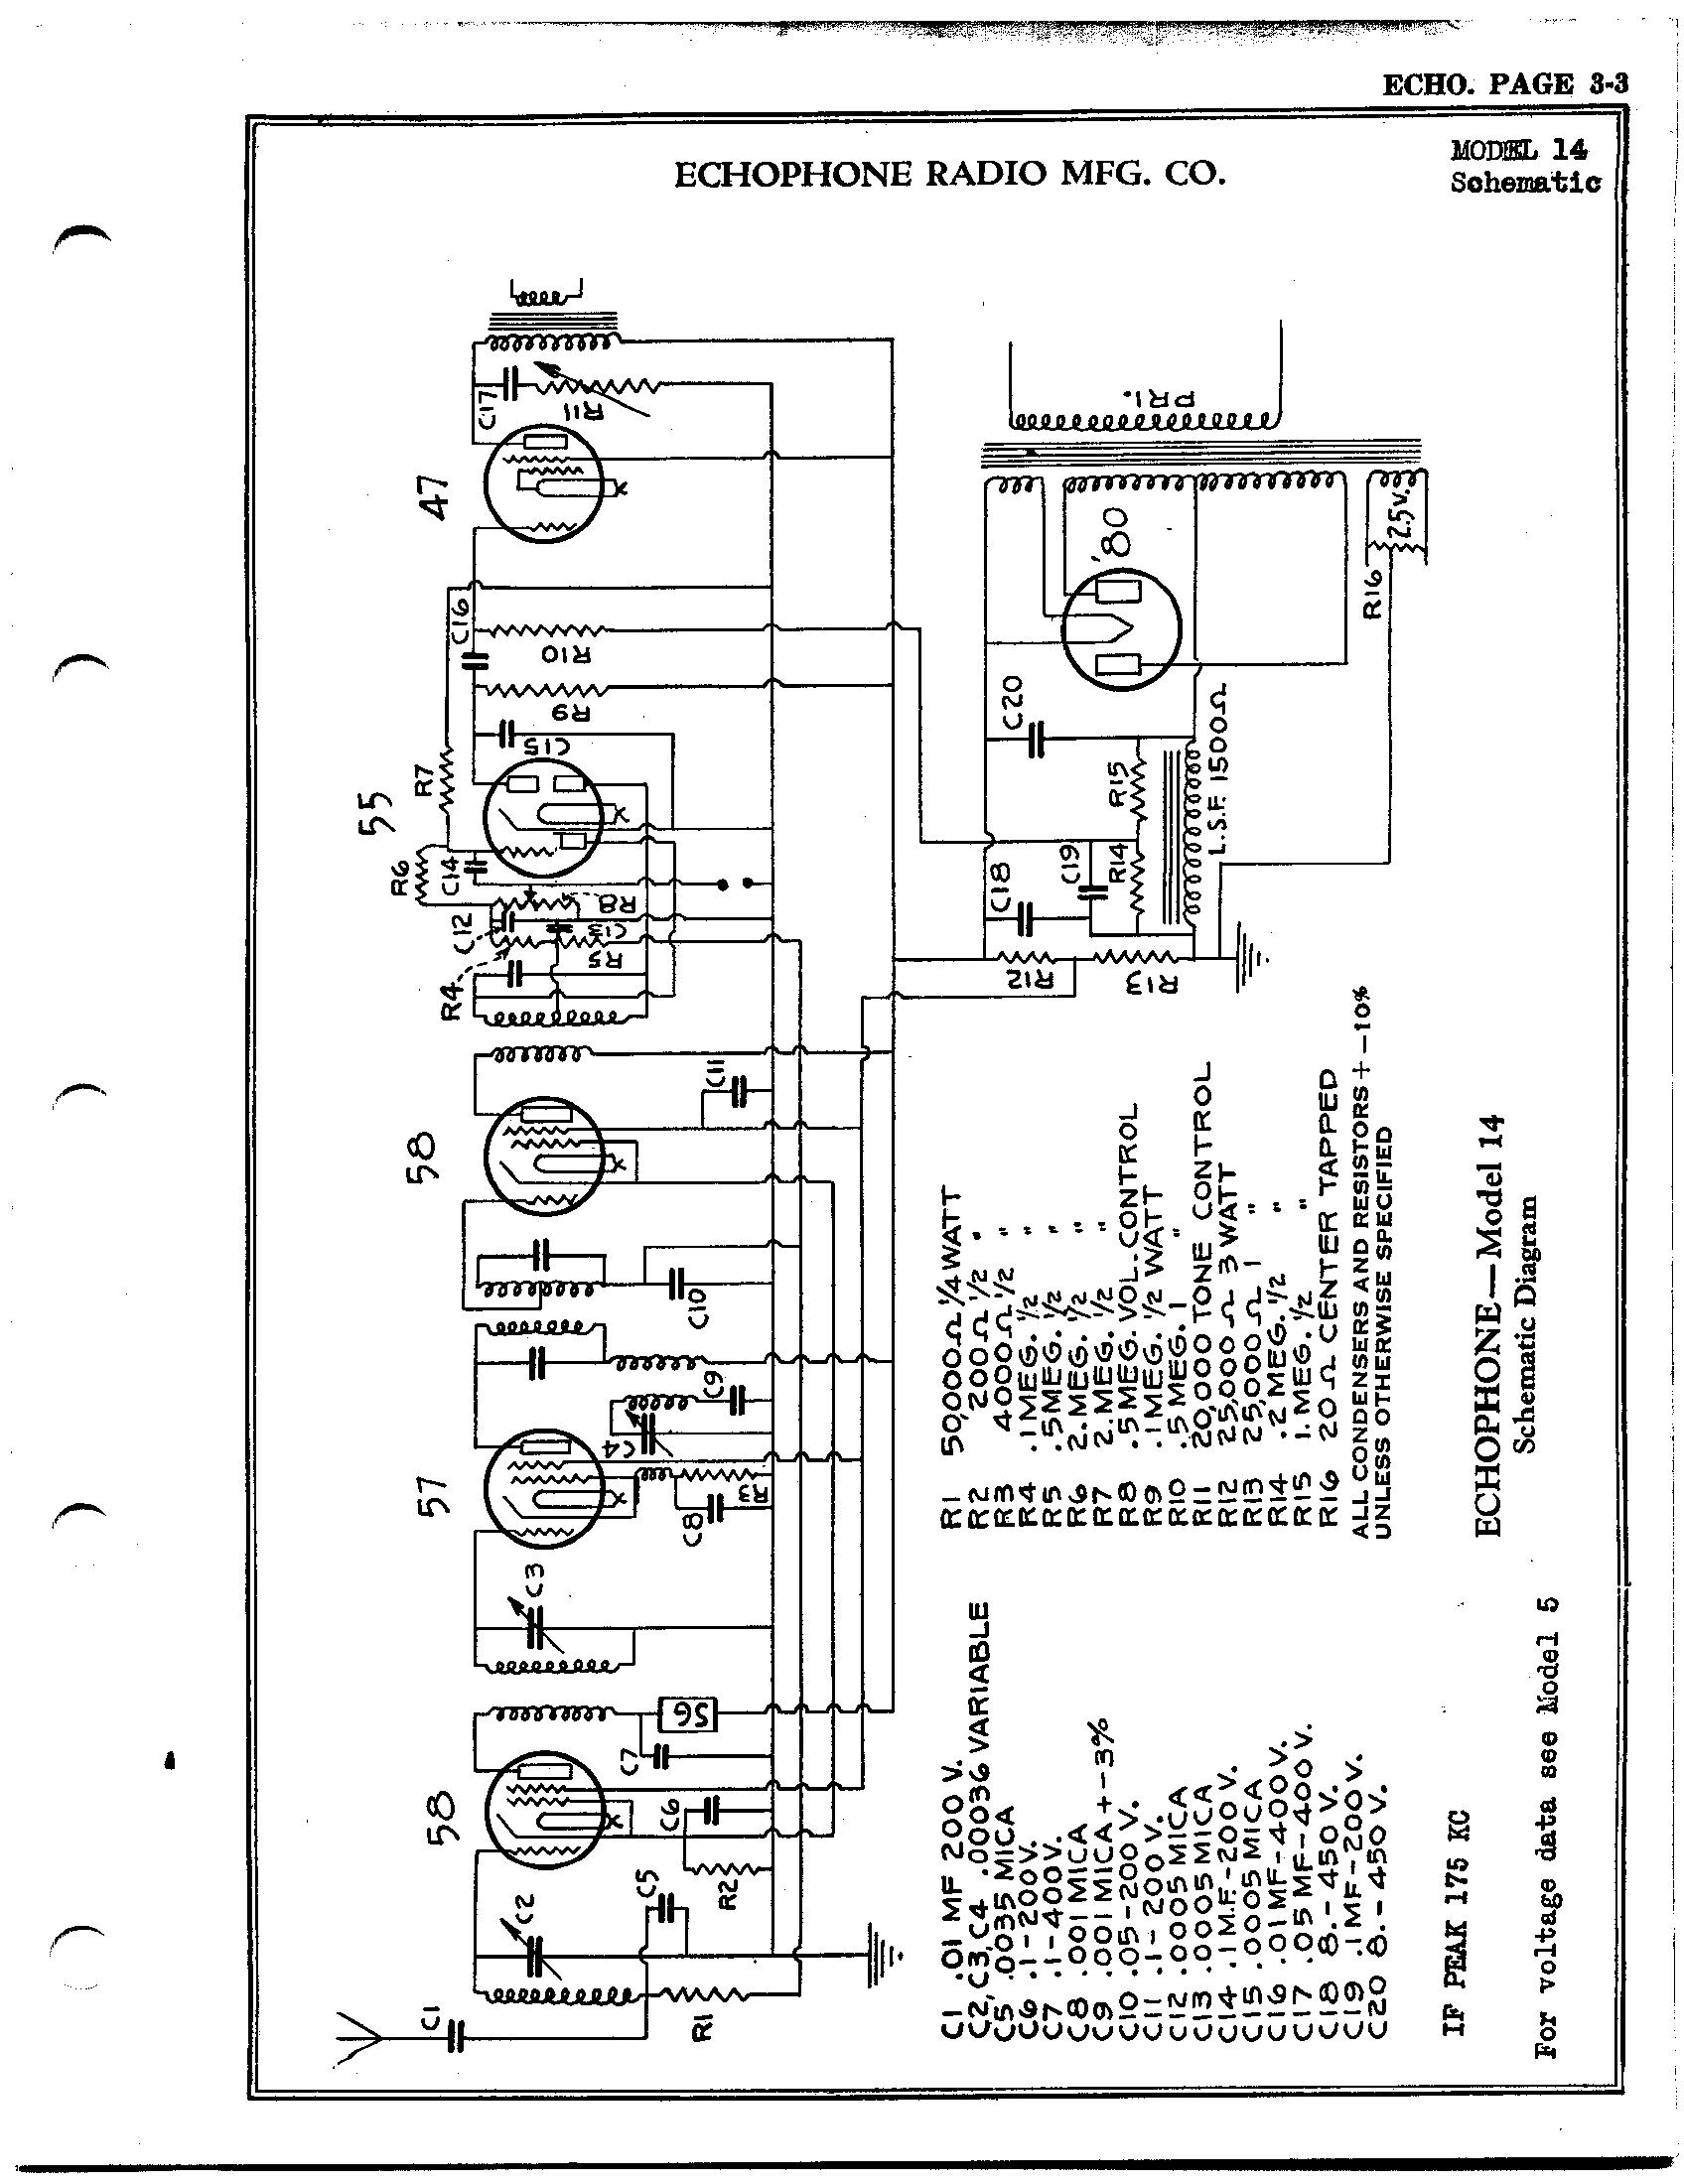 Echophone Radio Corp 14